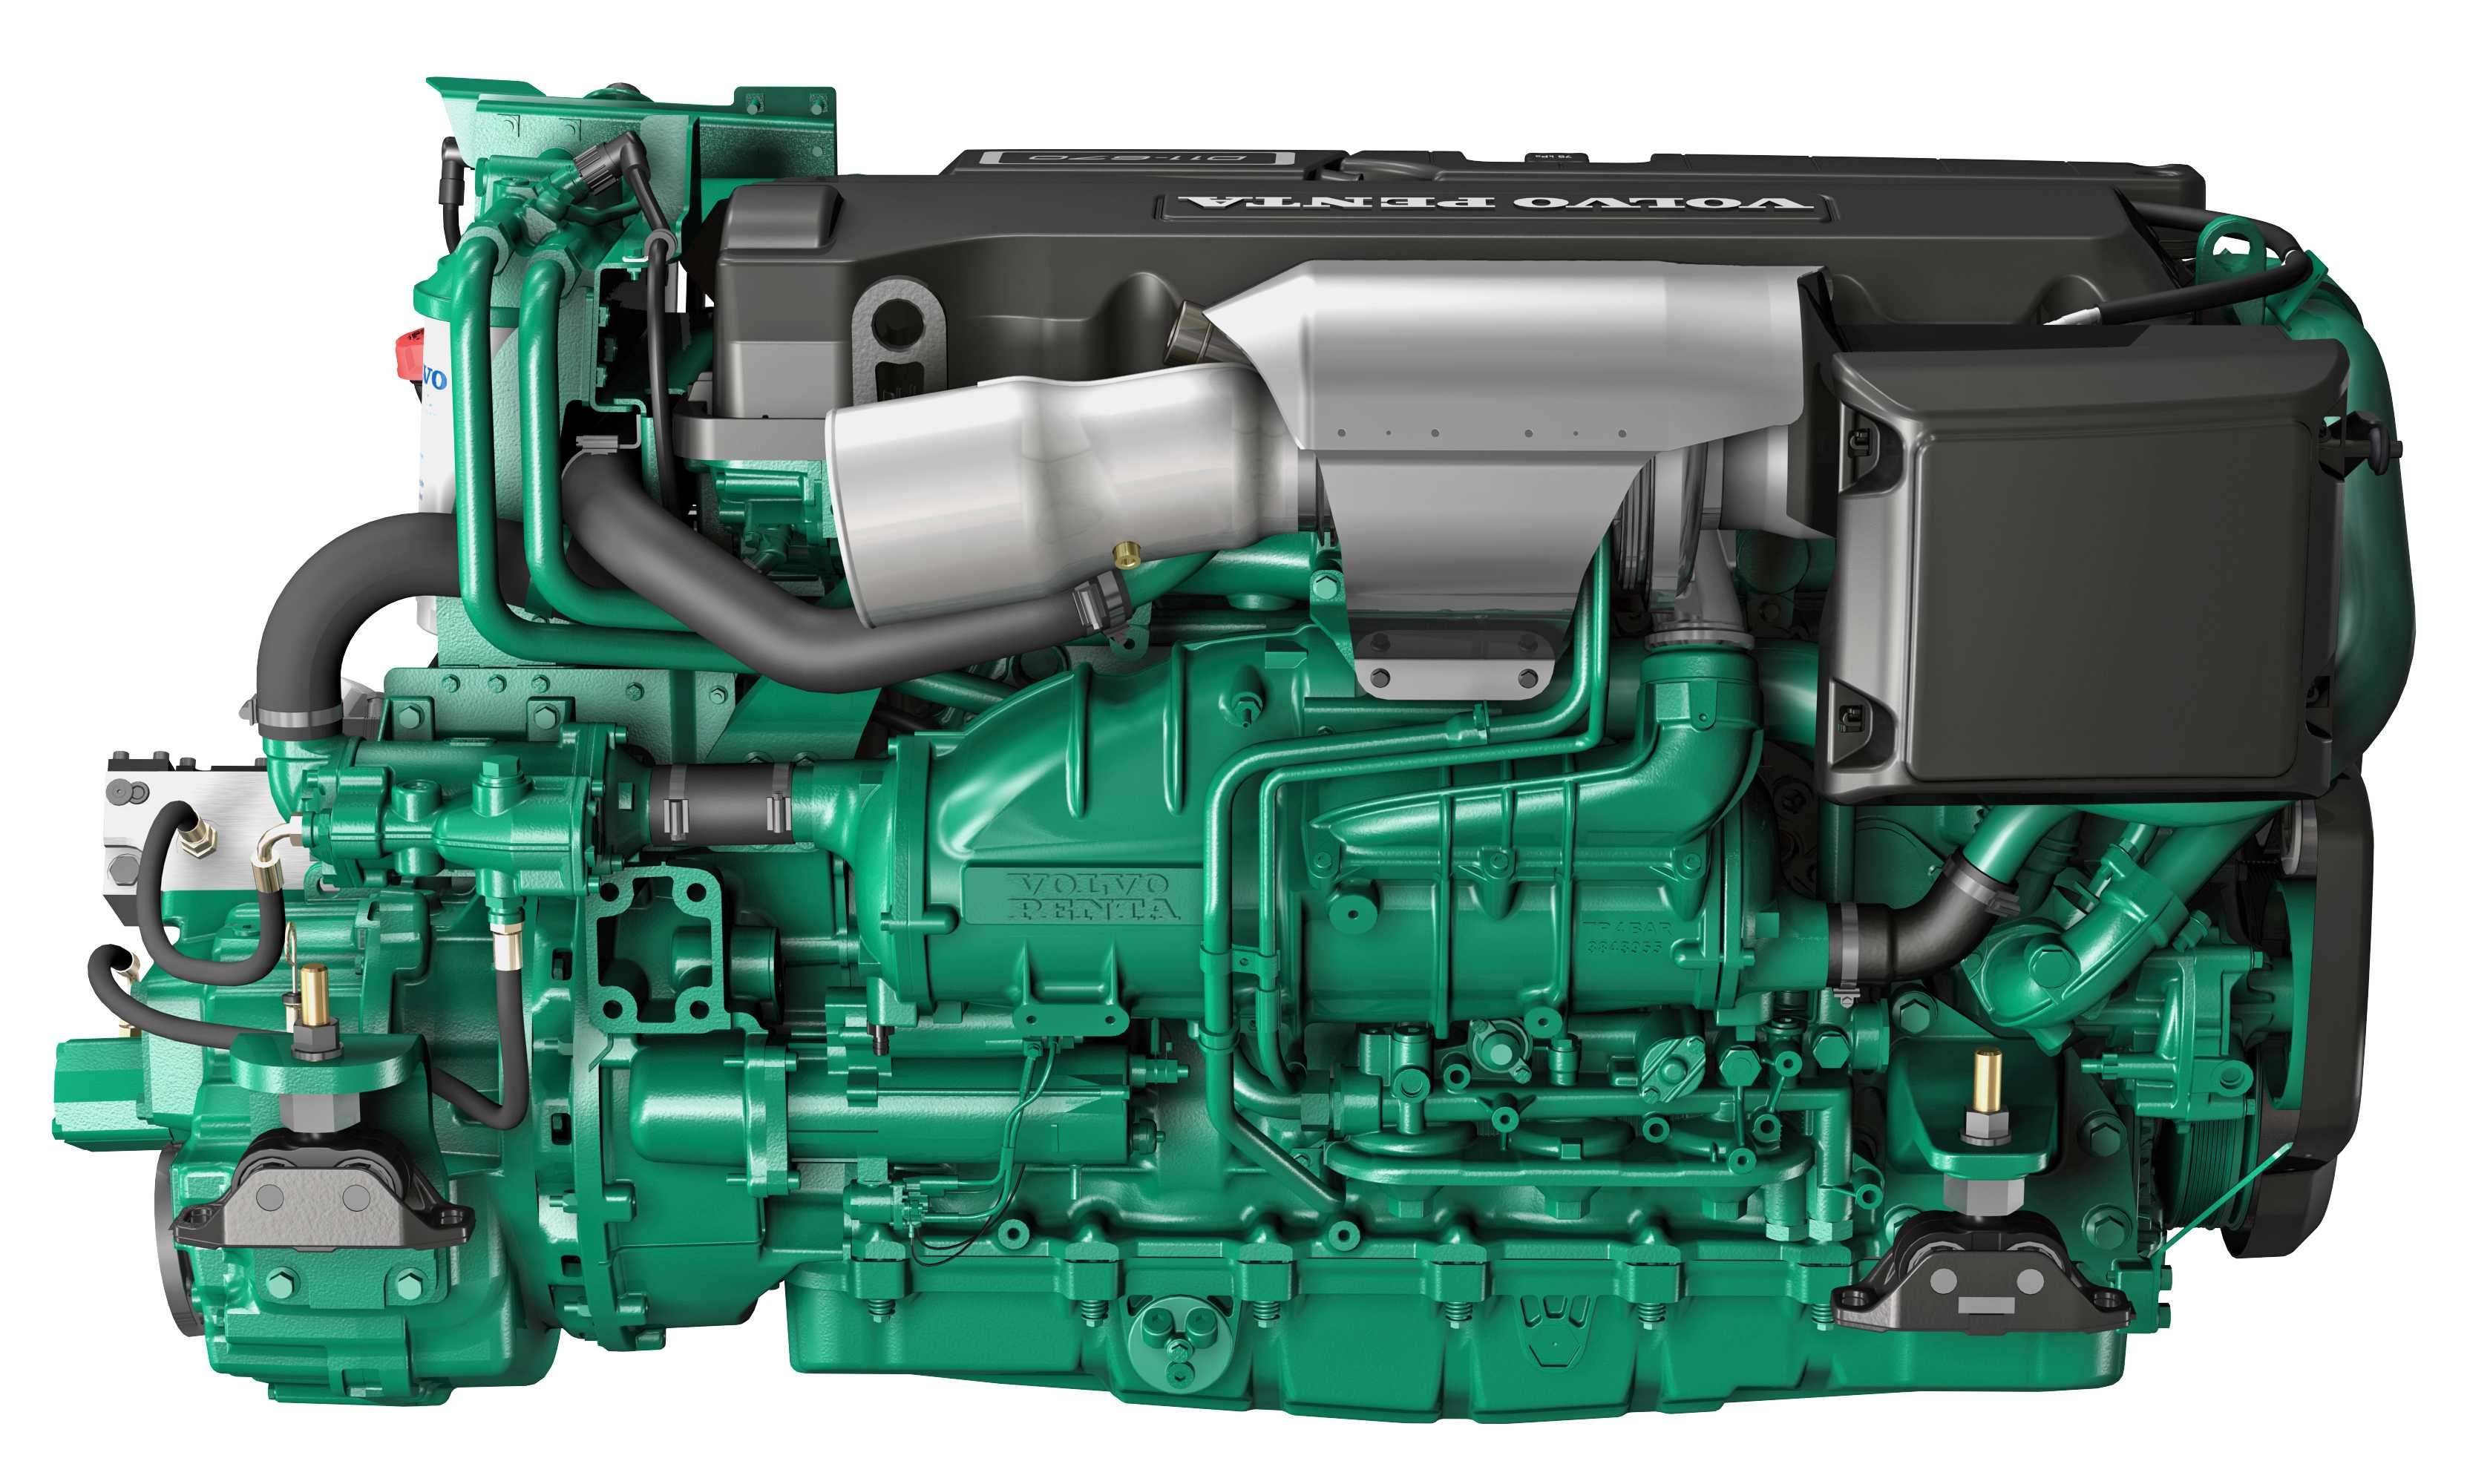 vpdpsoutdrive parts vpoutdrivespecs penta marine volvo engines specs outdrive express